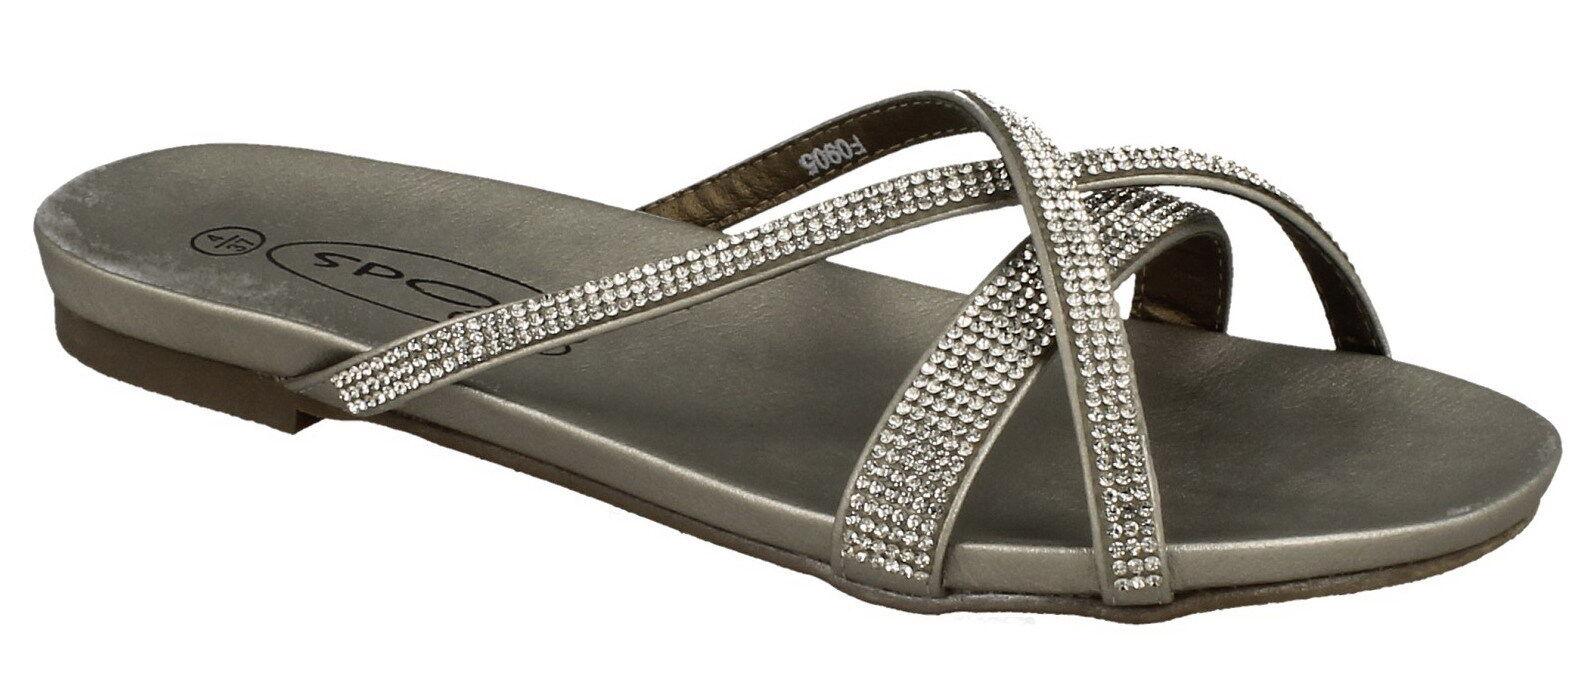 SALE Spot Diamante On F0905 Ladies Silver Diamante Spot Synthetic Slip on Summer Sandals dd8748